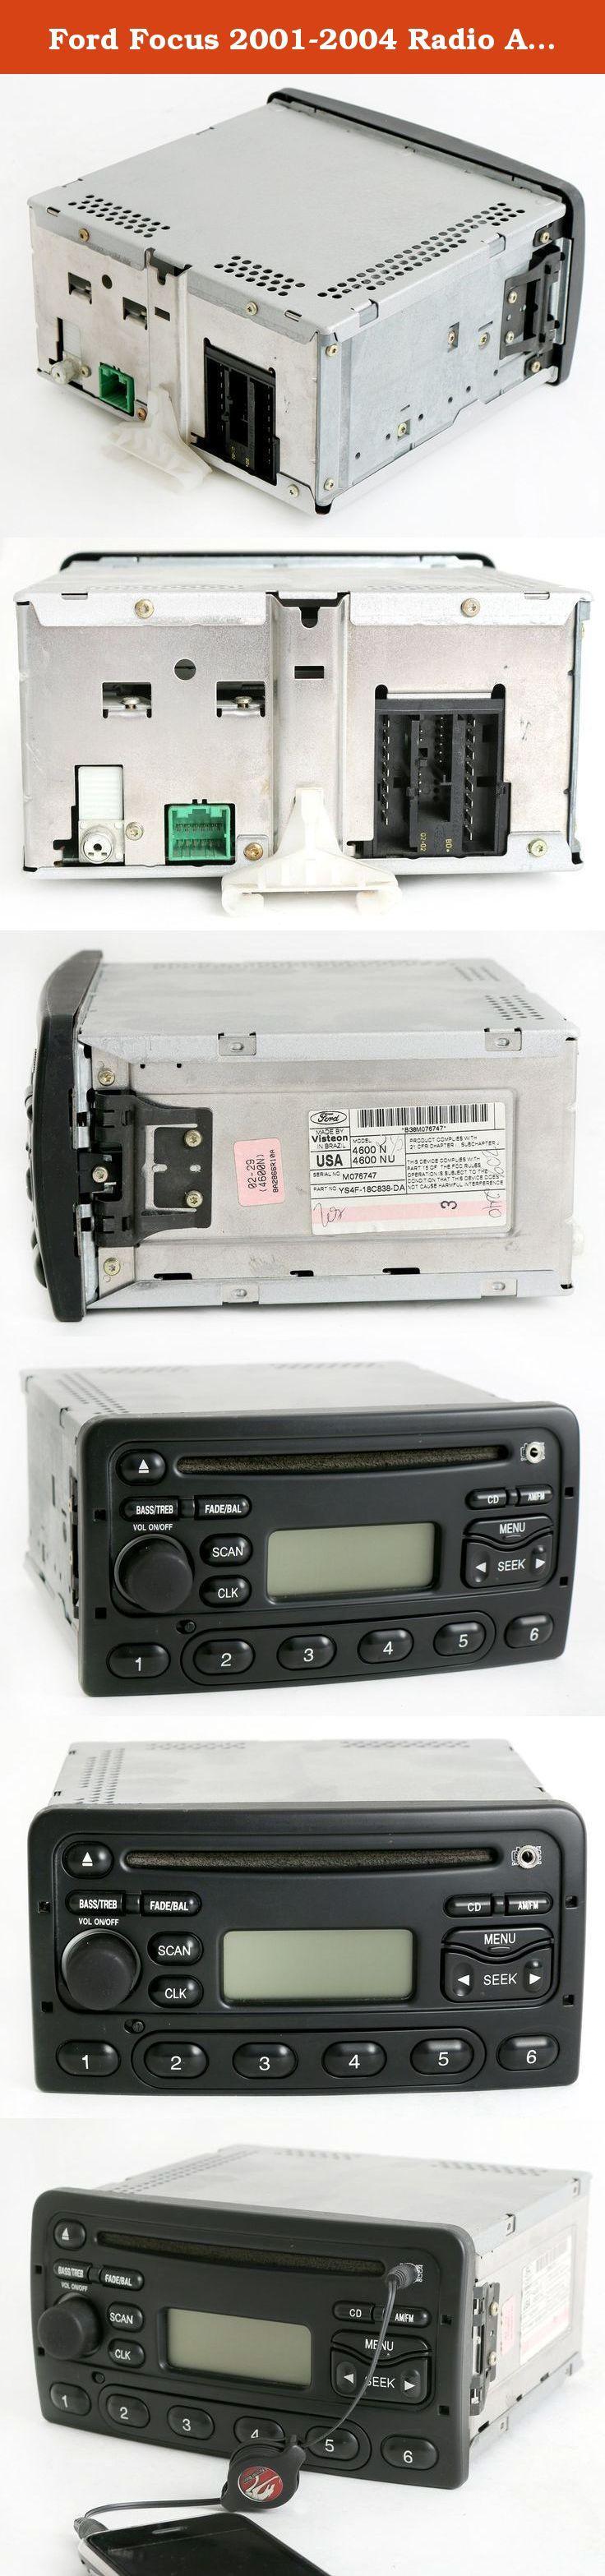 Ford focus 2001 2004 radio am fm cd player upgraded w aux input ys4f